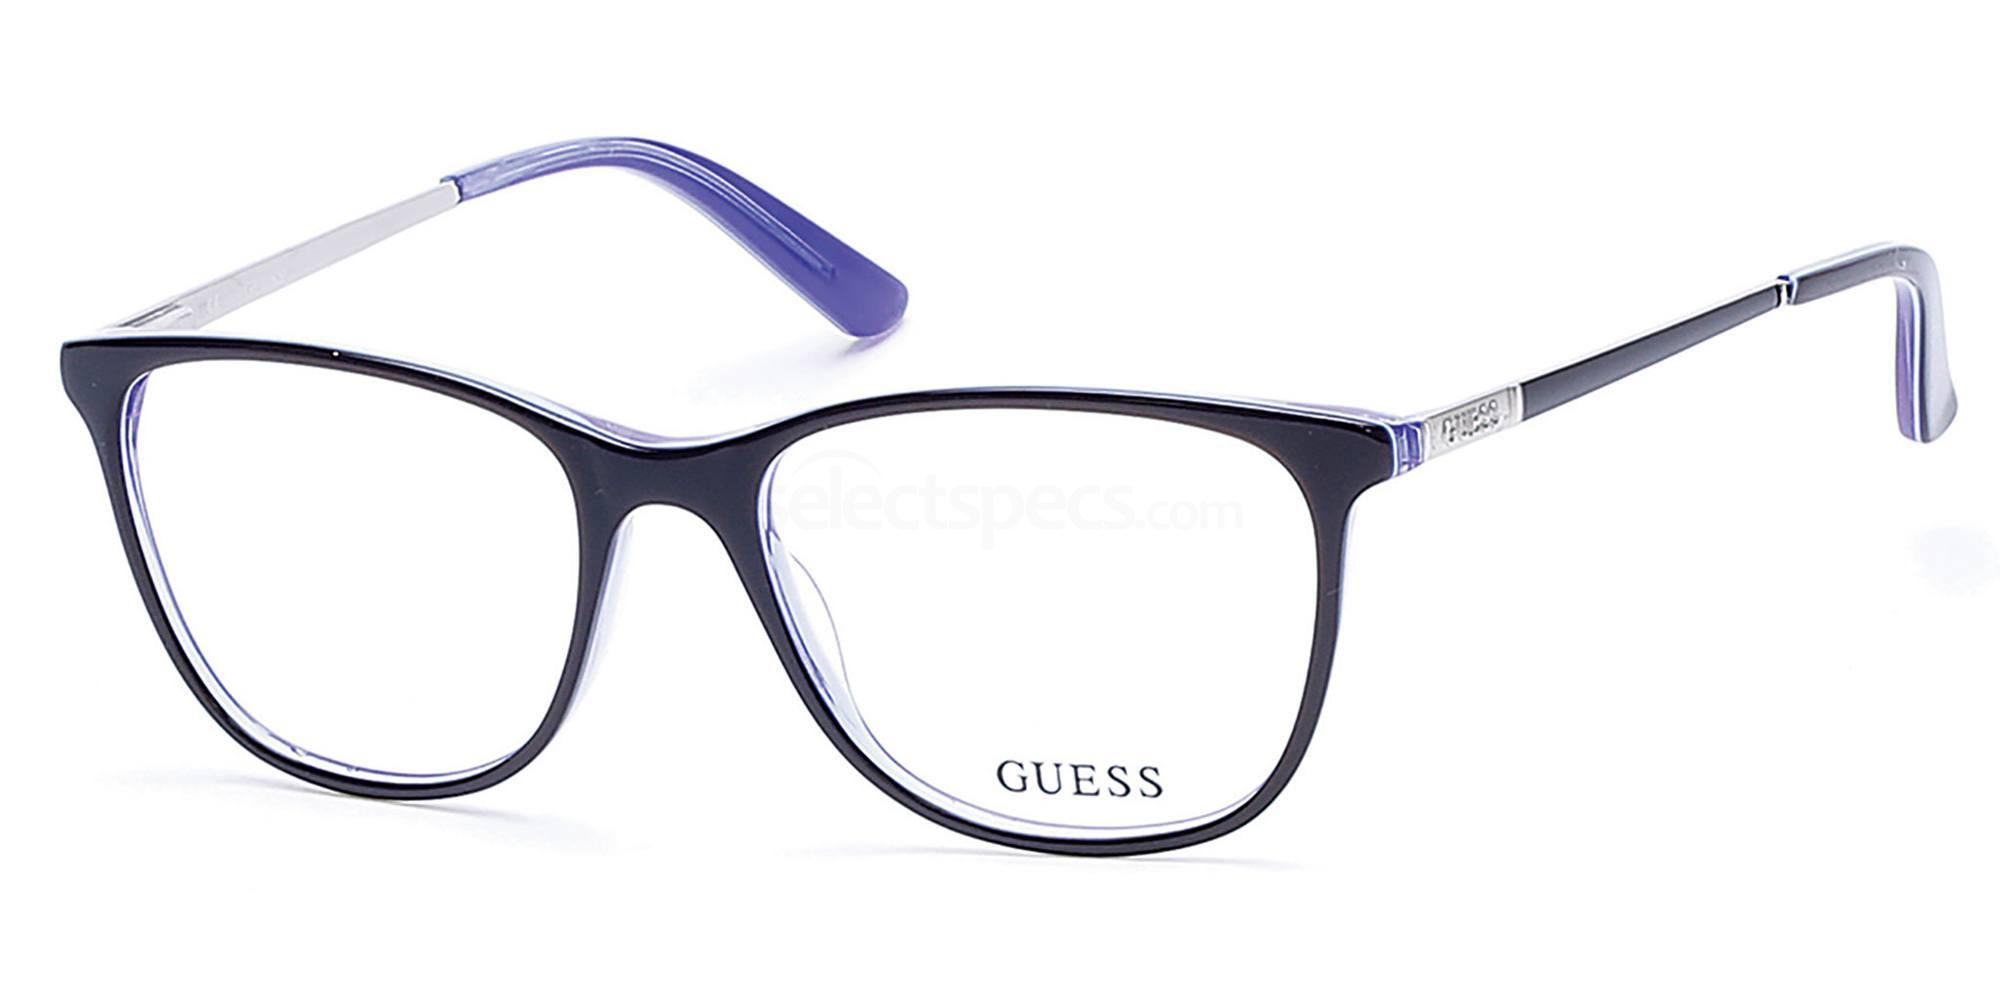 001 GU2566 Glasses, Guess